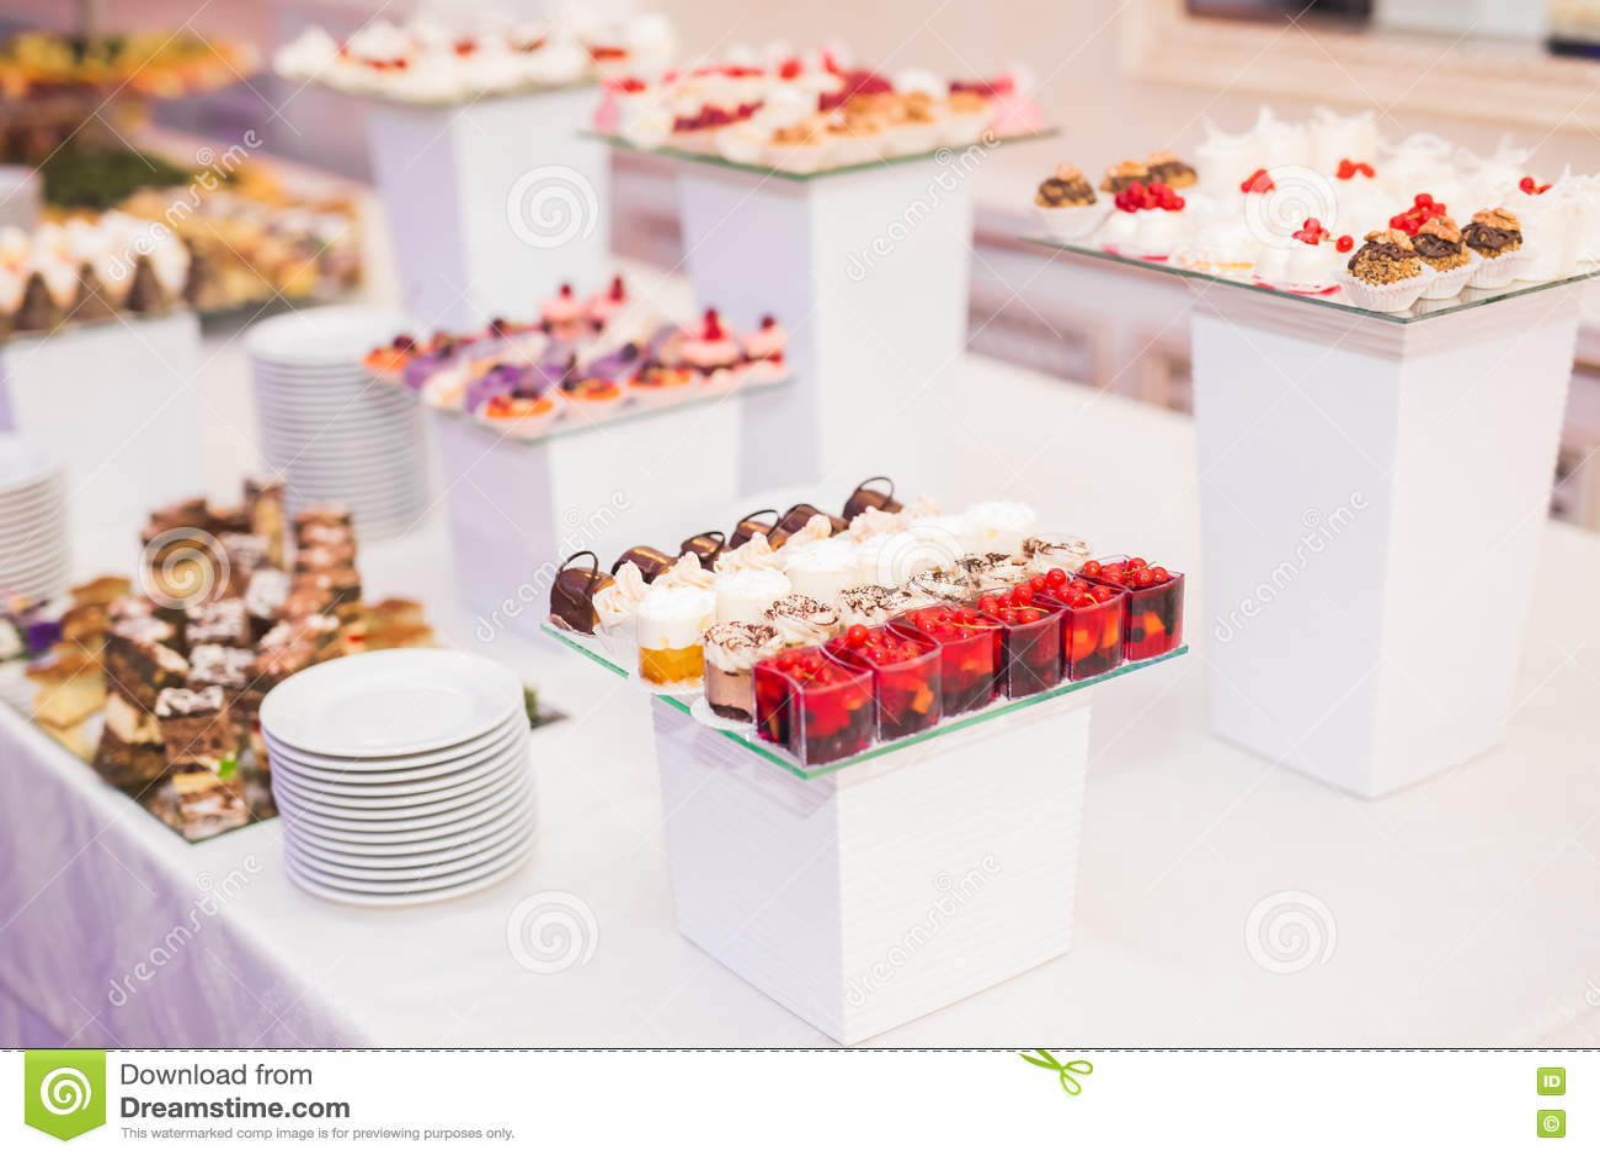 Olika sorter av bakade sötsaker på en buffé